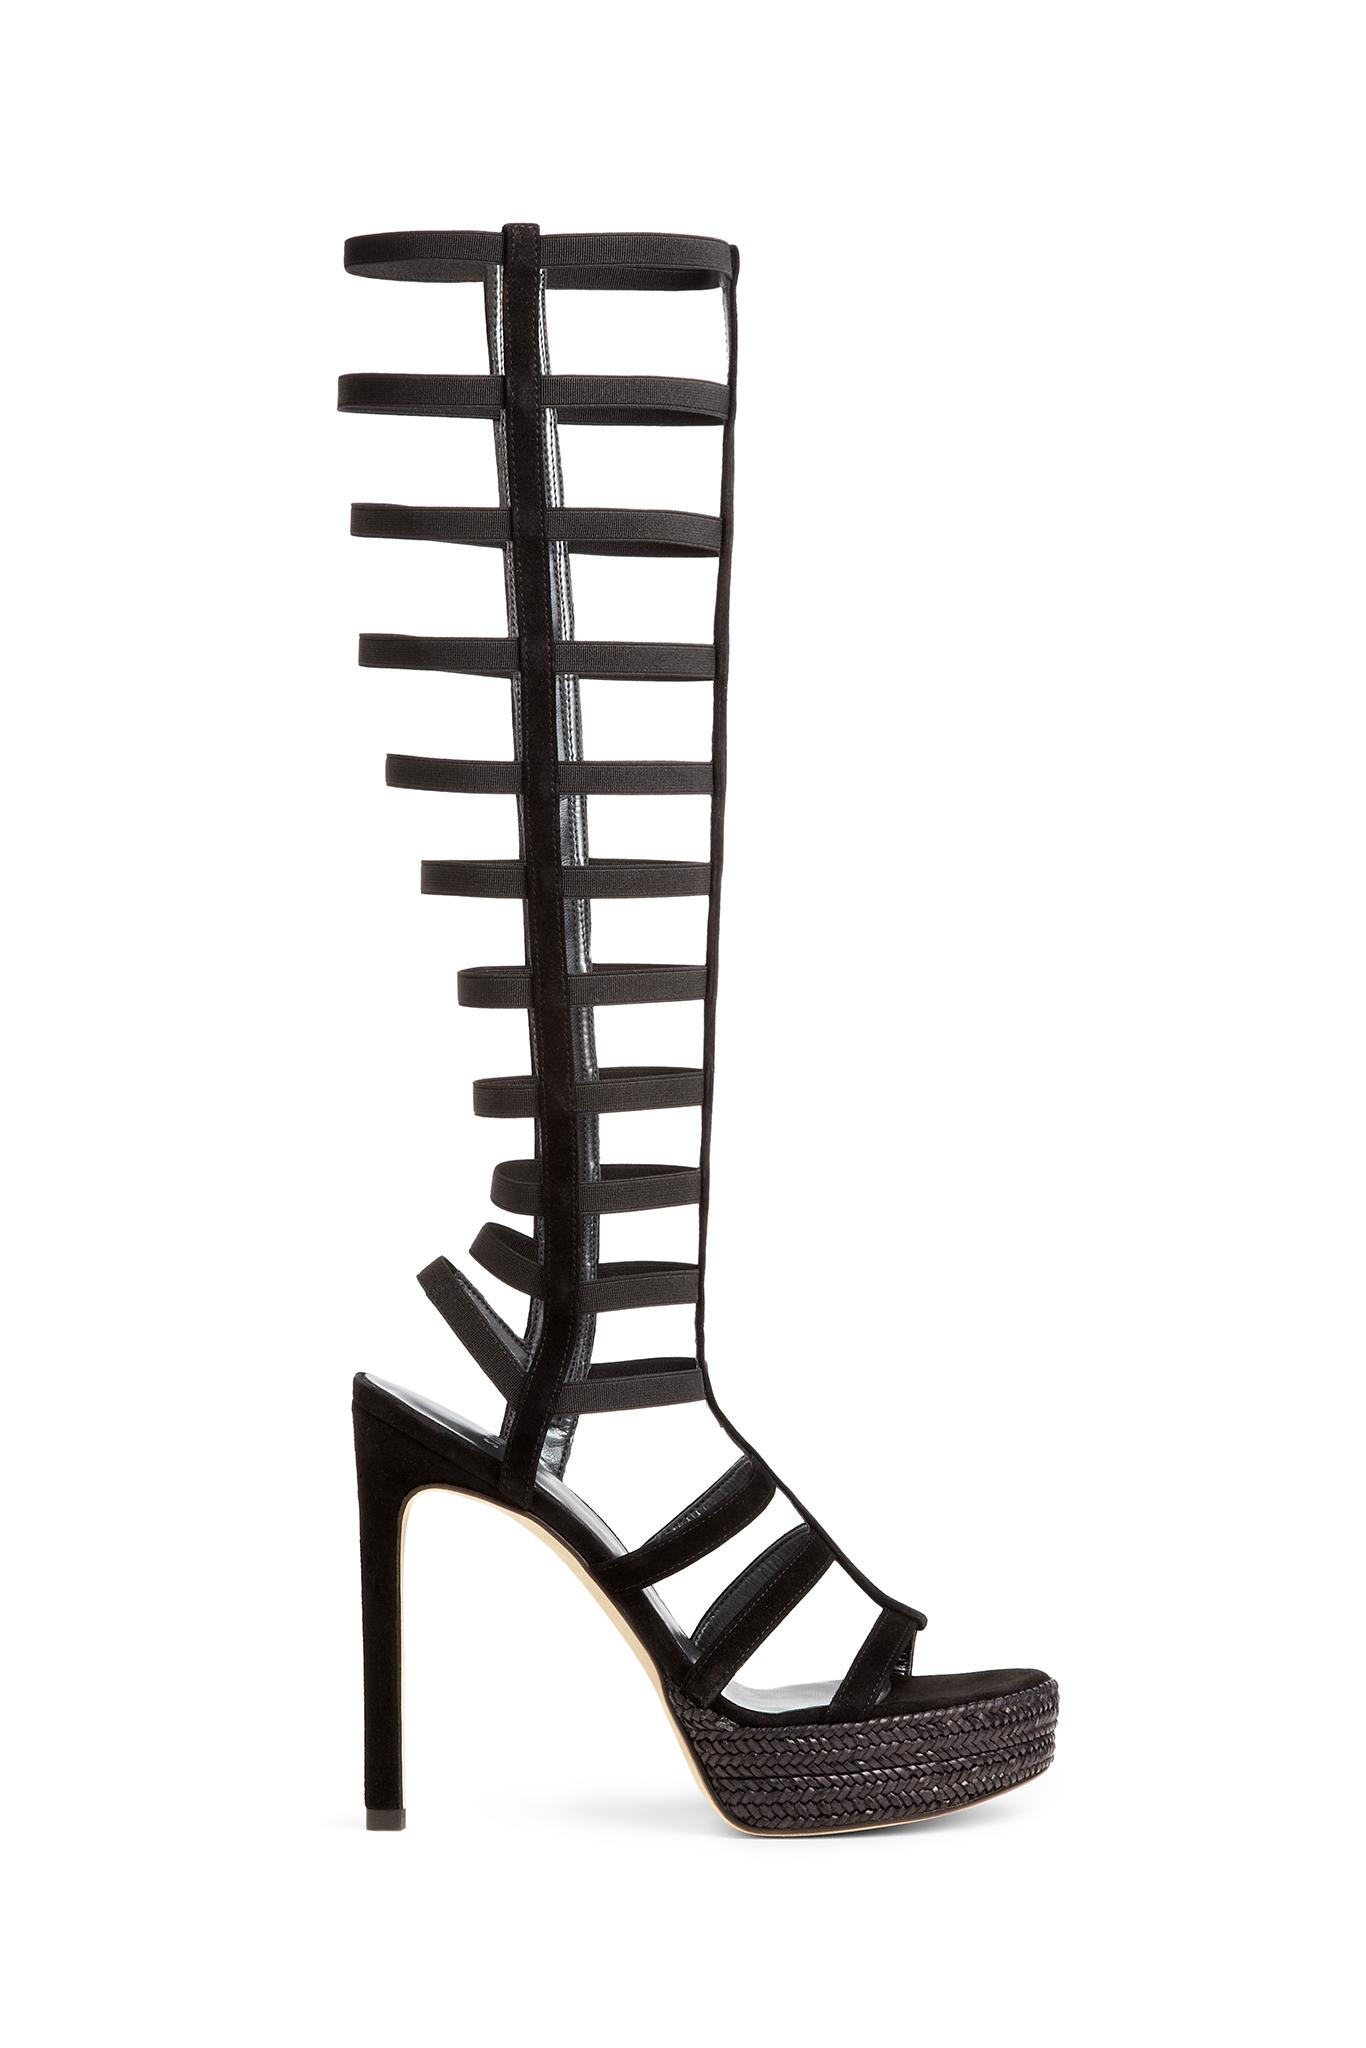 03-07-heeled-gladiator.jpg